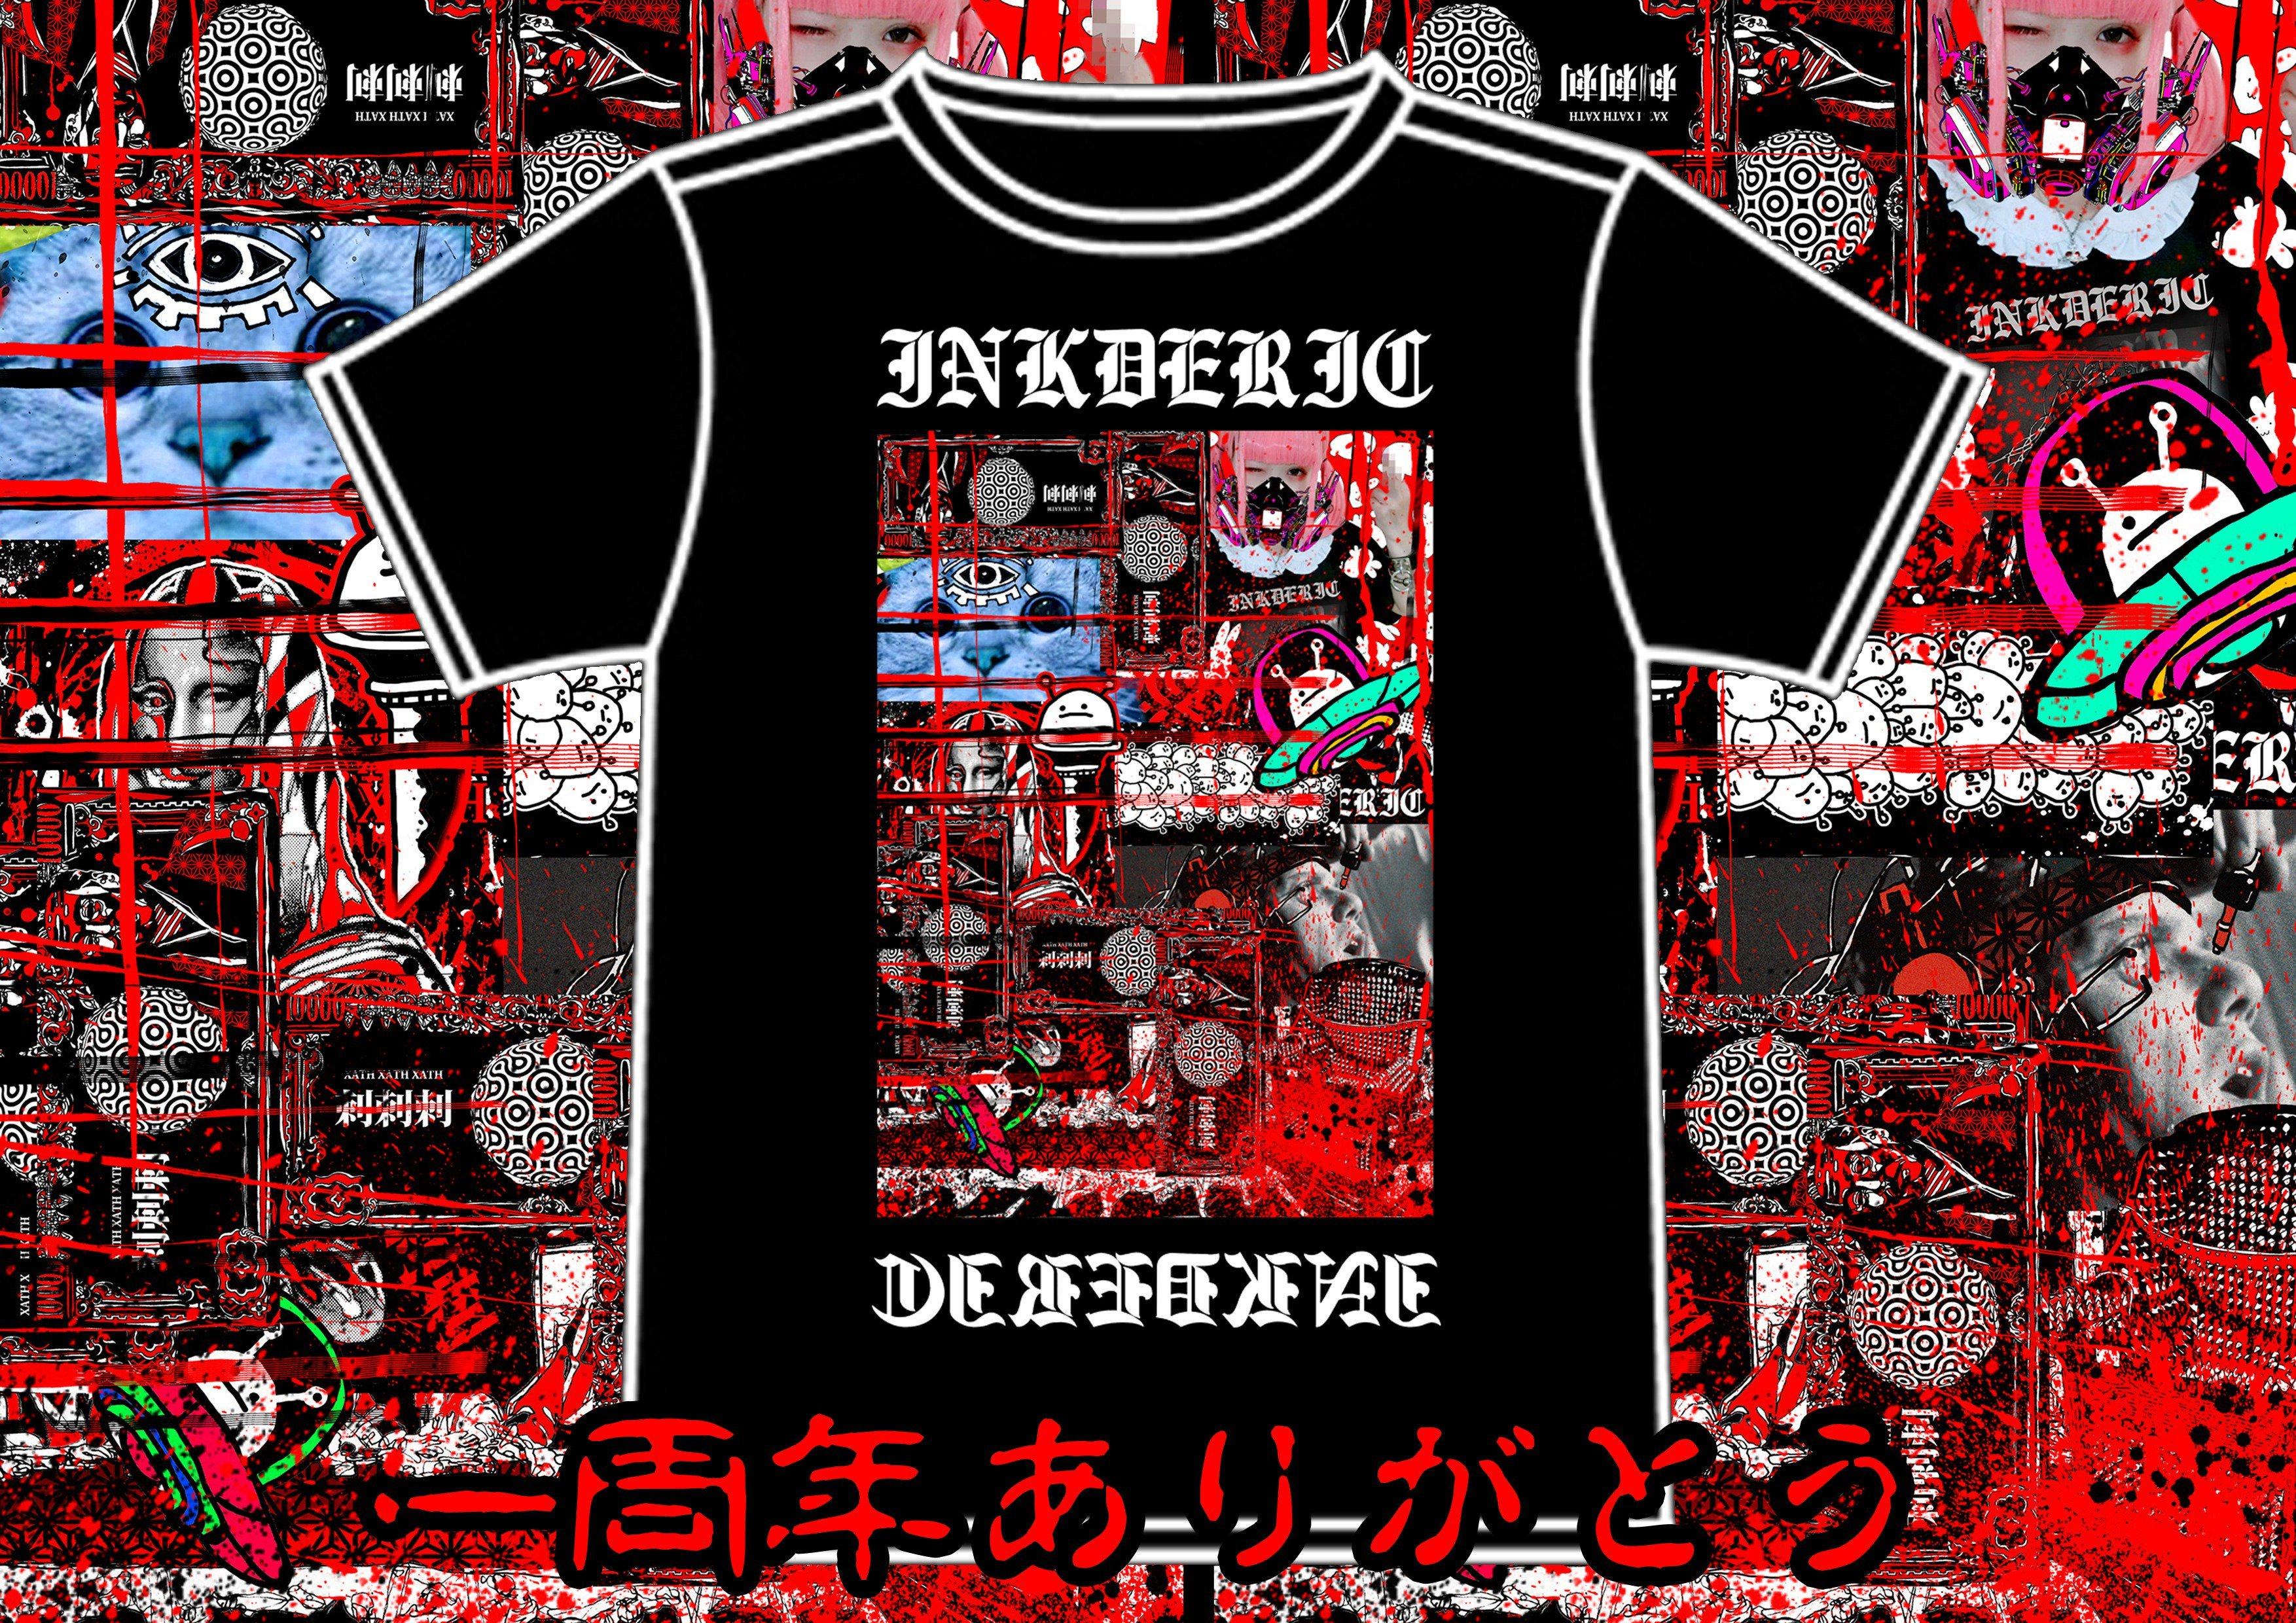 INKDERIC 一周年コラージュTシャツ